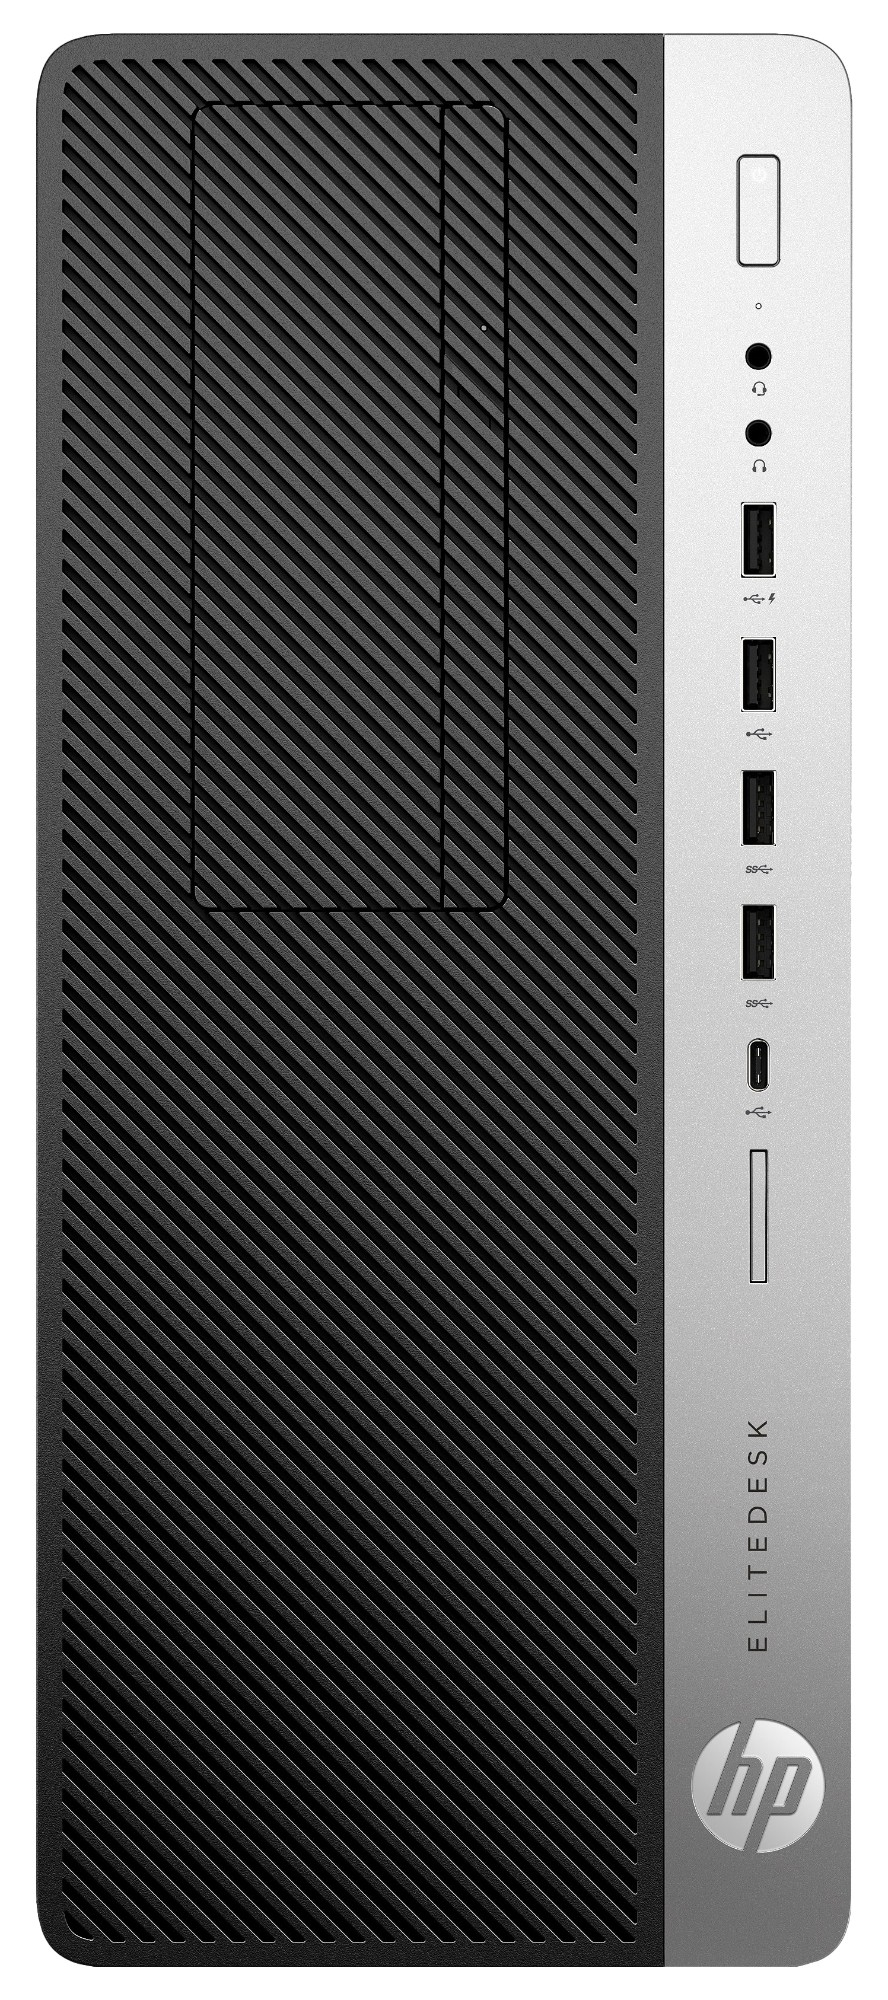 HP EliteDesk 800 G5 9th gen Intel® Core™ i7 i7-9700 16 GB DDR4-SDRAM 1000 GB SSD Black Tower PC